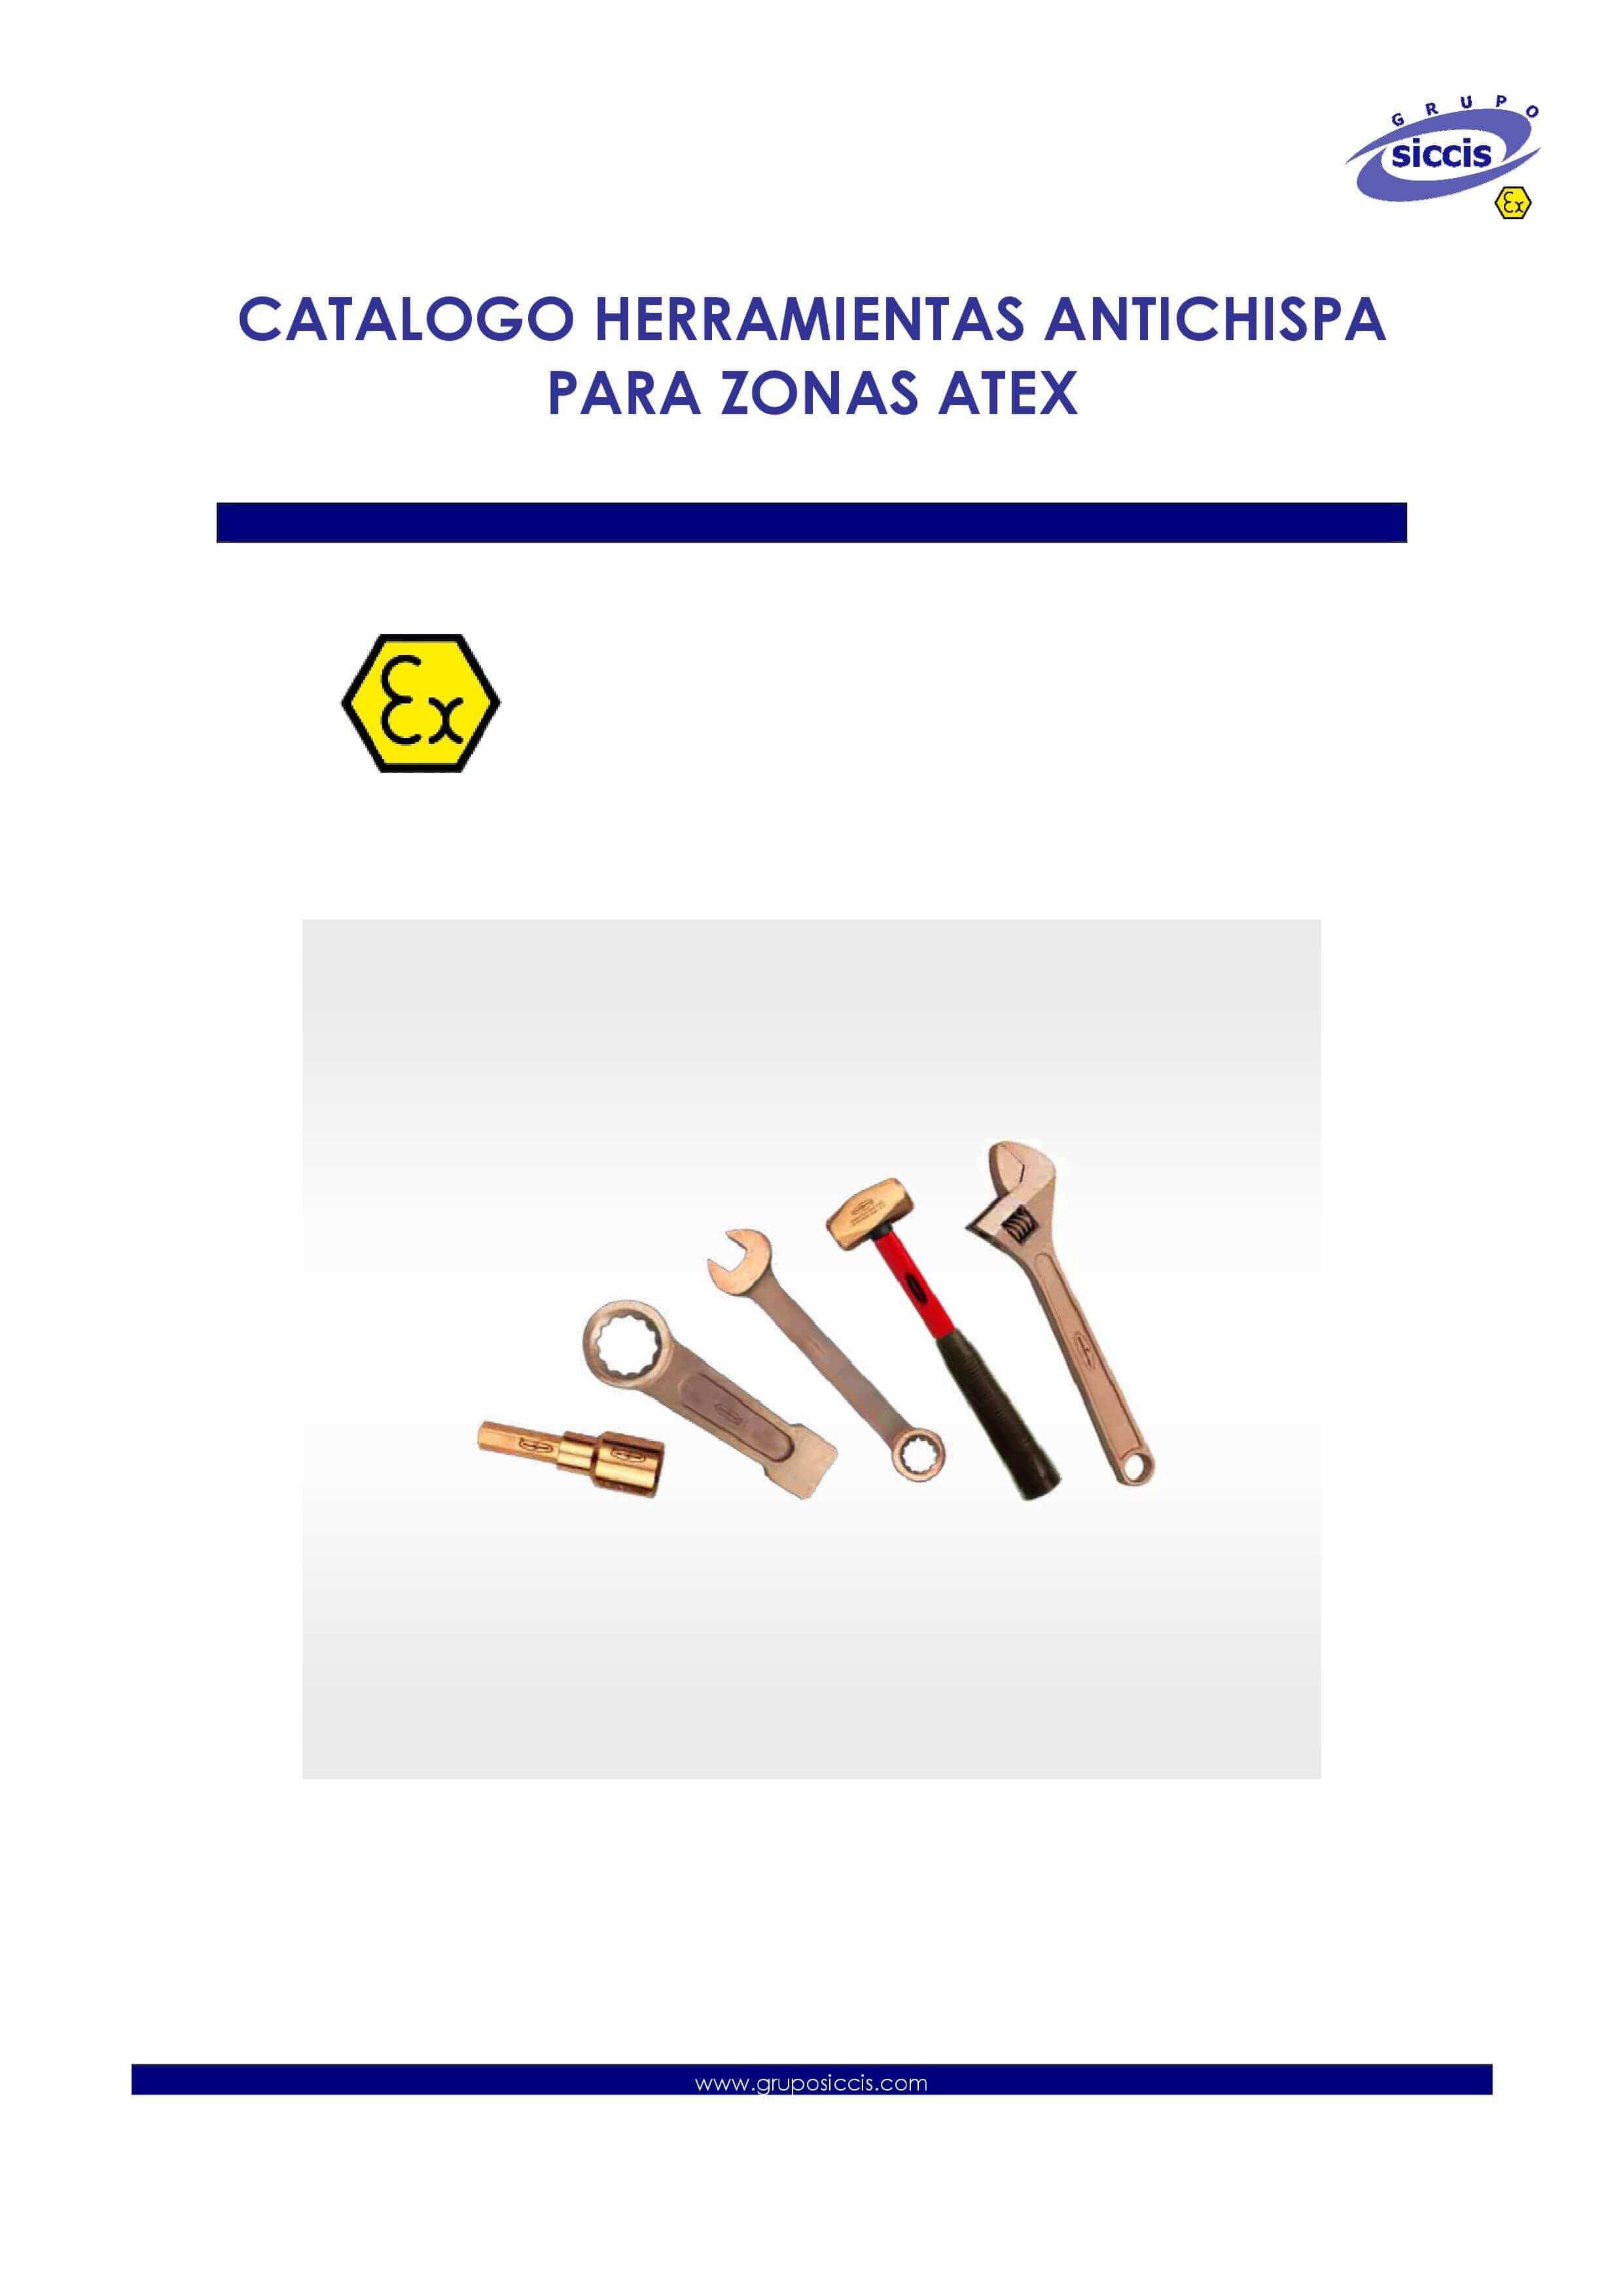 Catálogo de herramientas antichispa ATEX